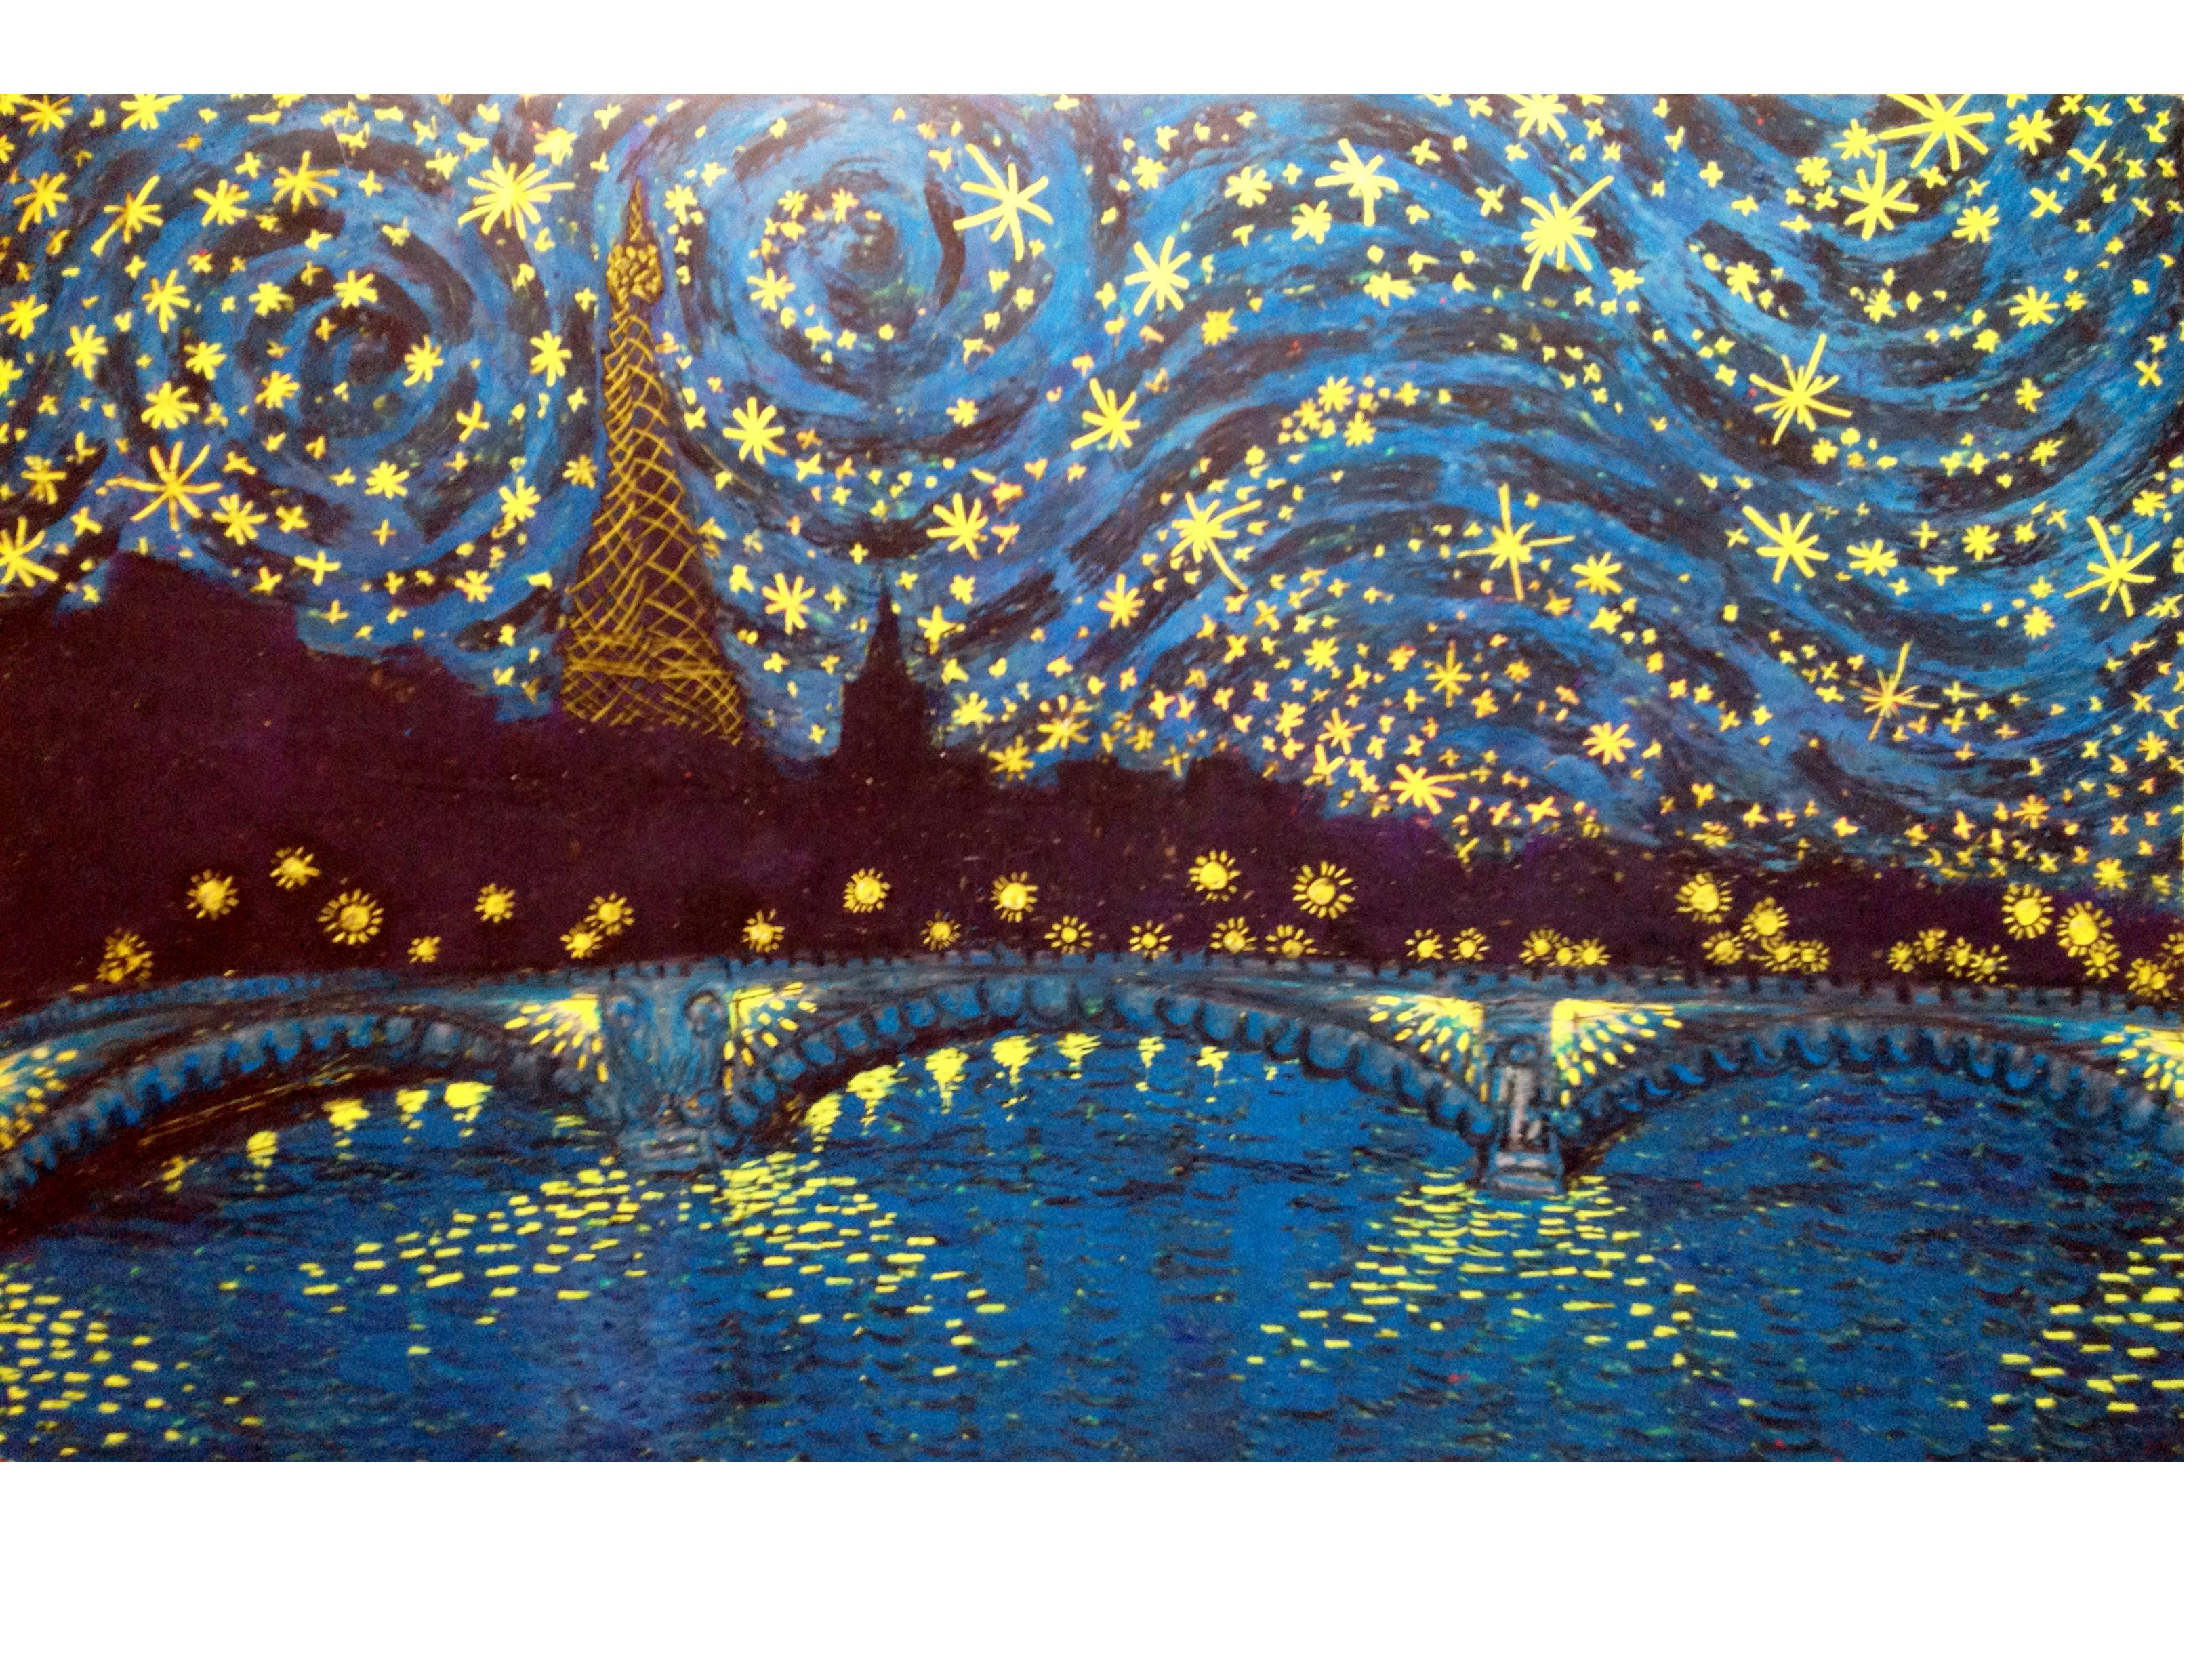 Vincent Van Gogh Images Paris France HD Wallpaper And Background Photos